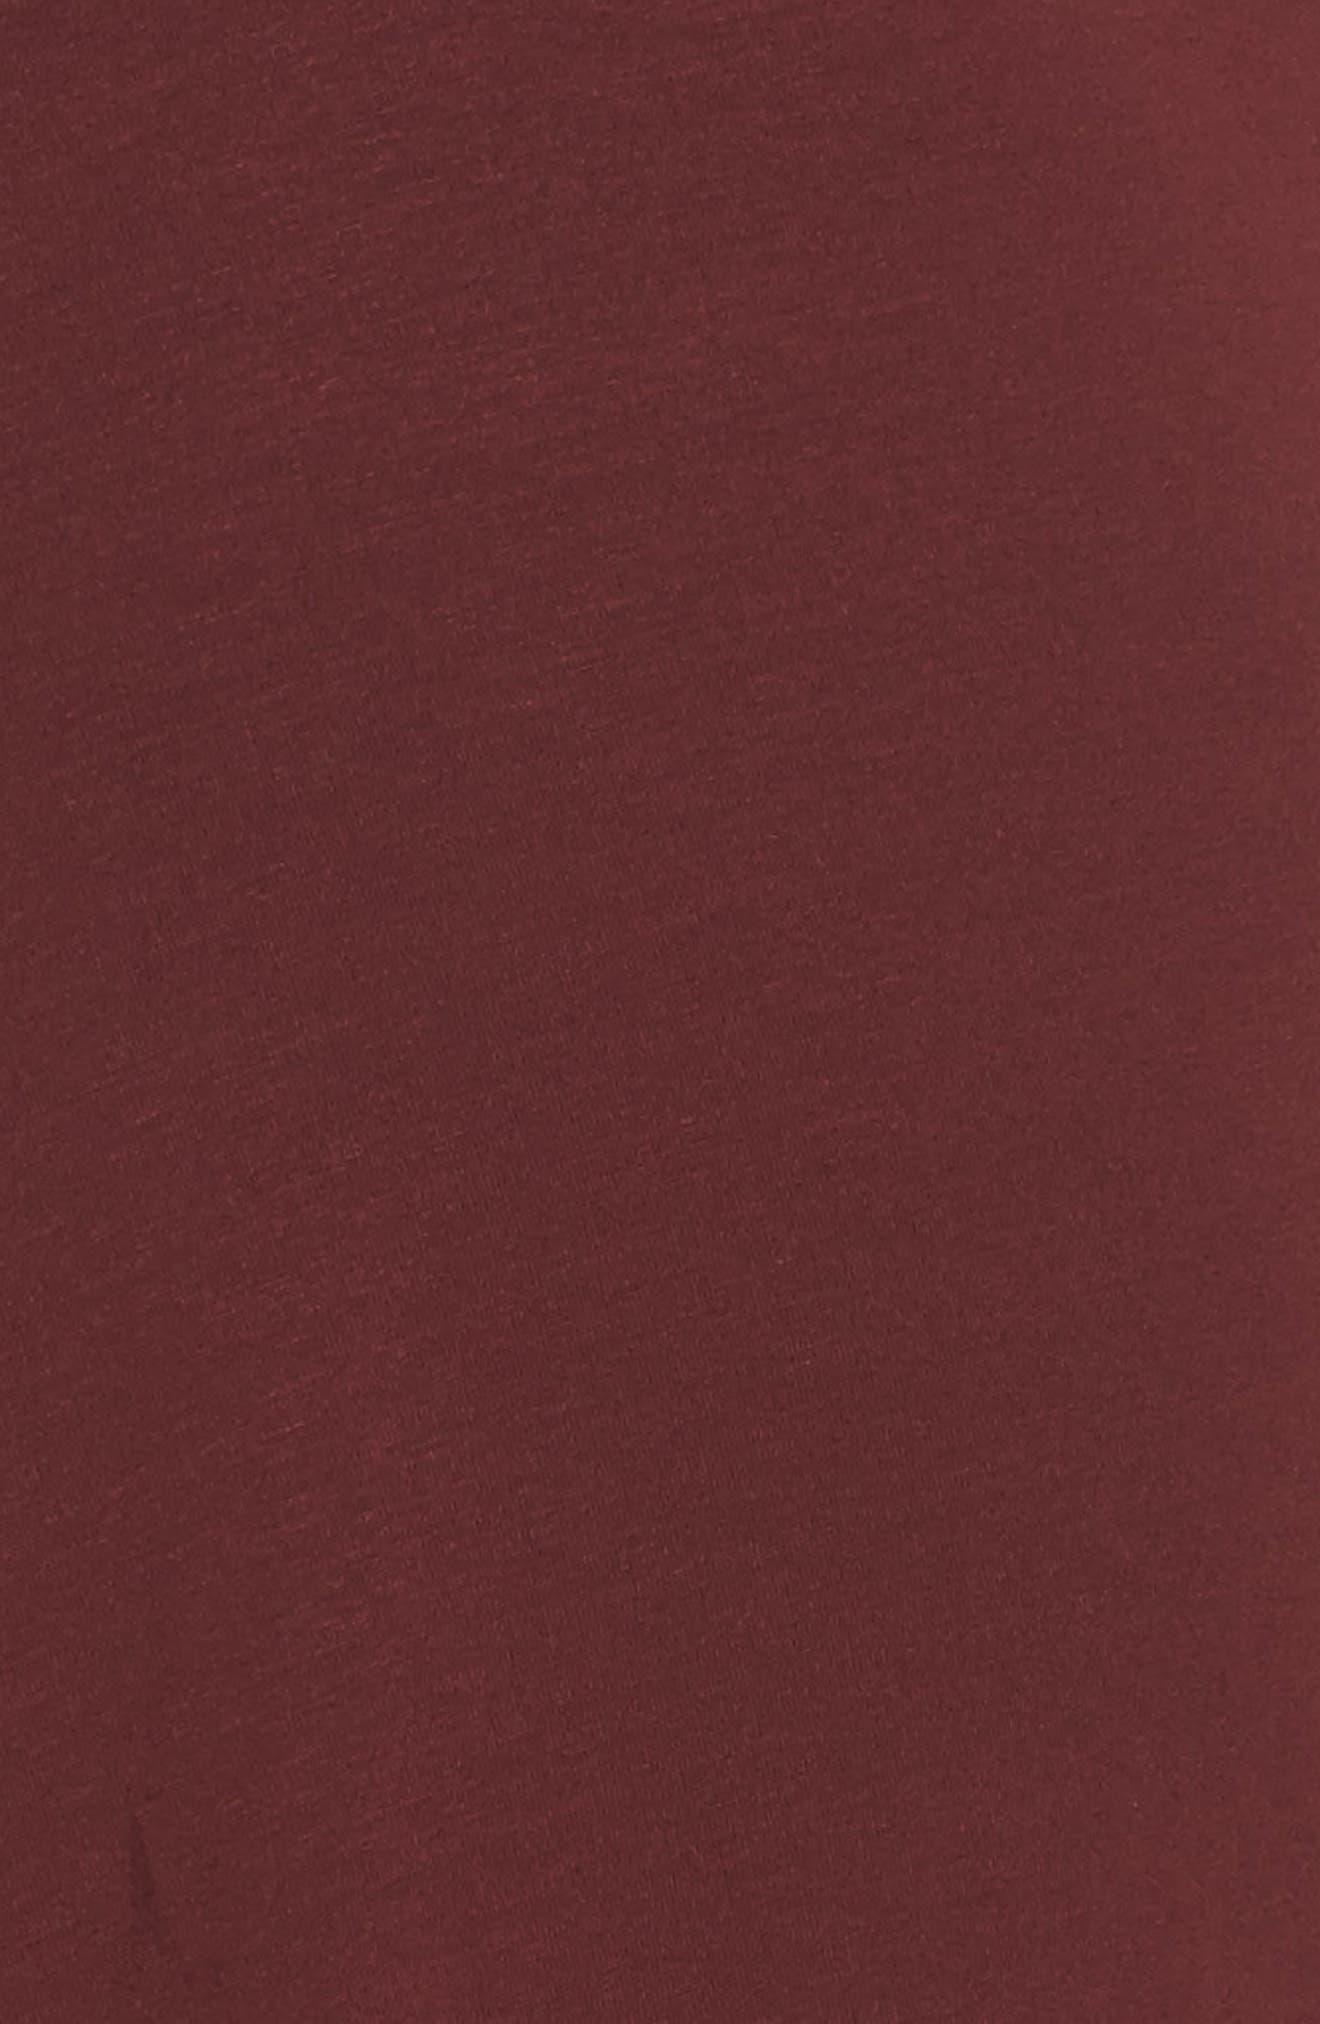 Jersey Tunic Dress,                             Alternate thumbnail 20, color,